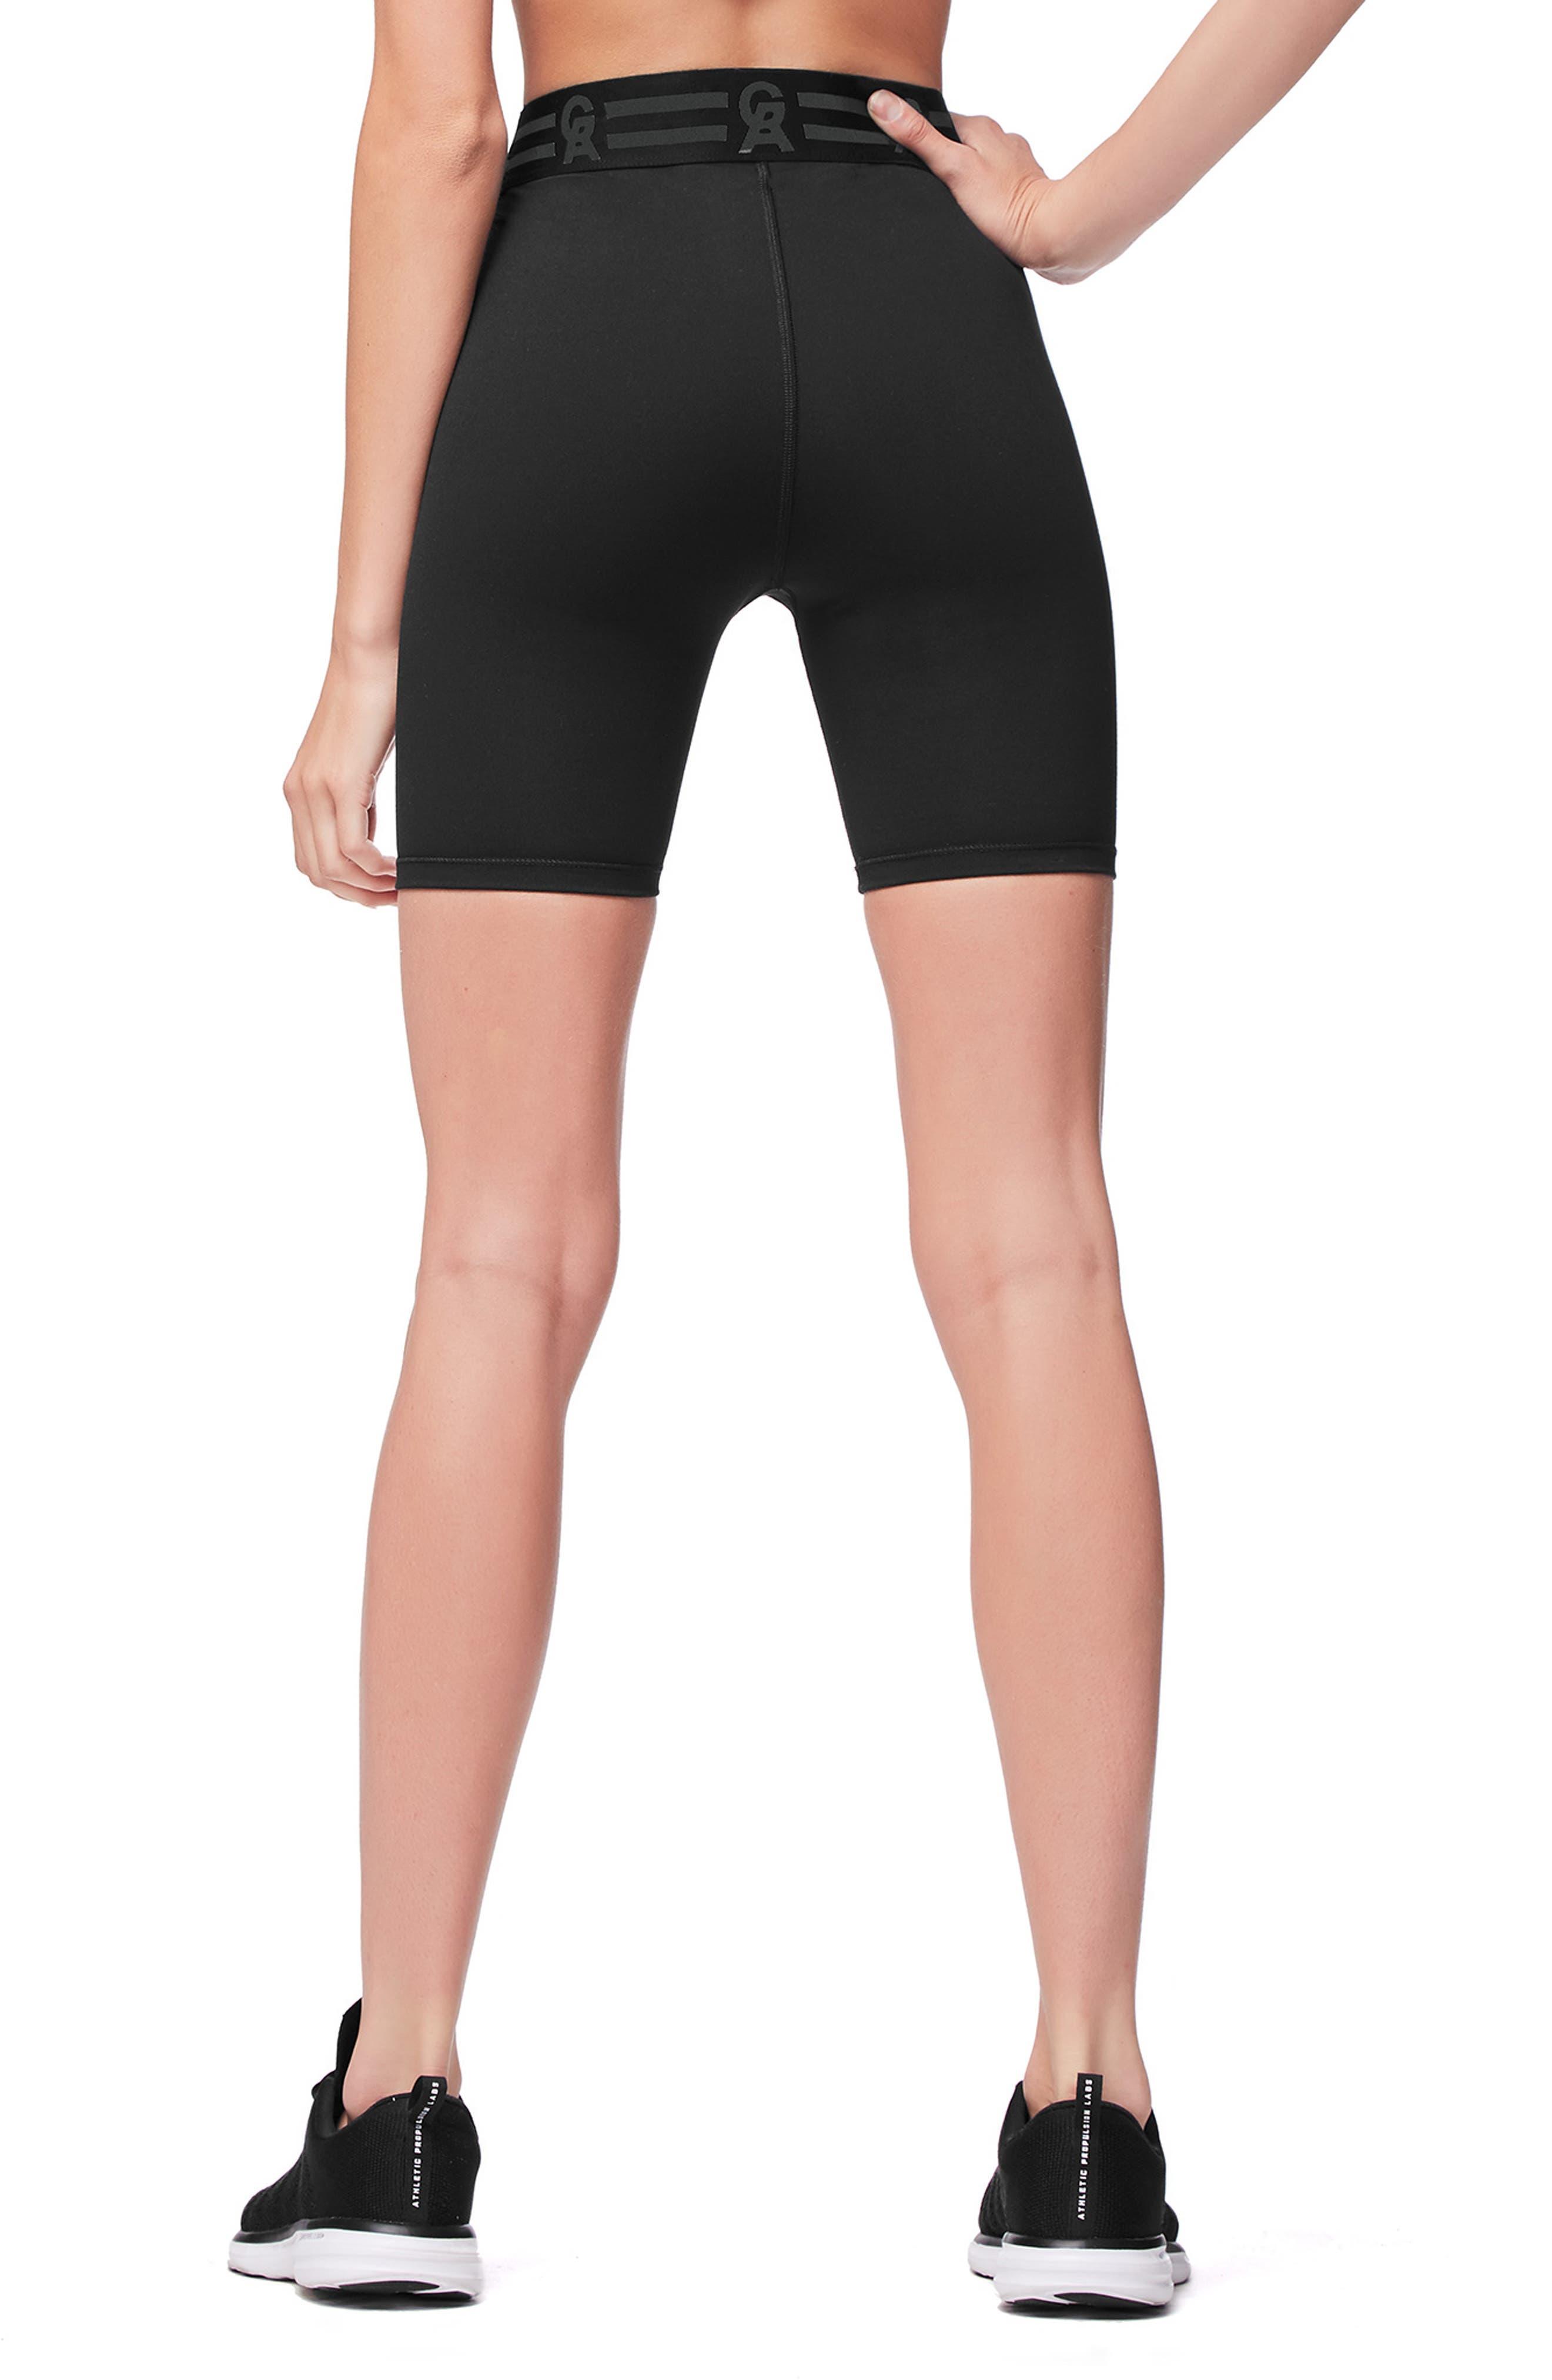 Icon High Waist Biker Shorts,                             Alternate thumbnail 3, color,                             BLACK001